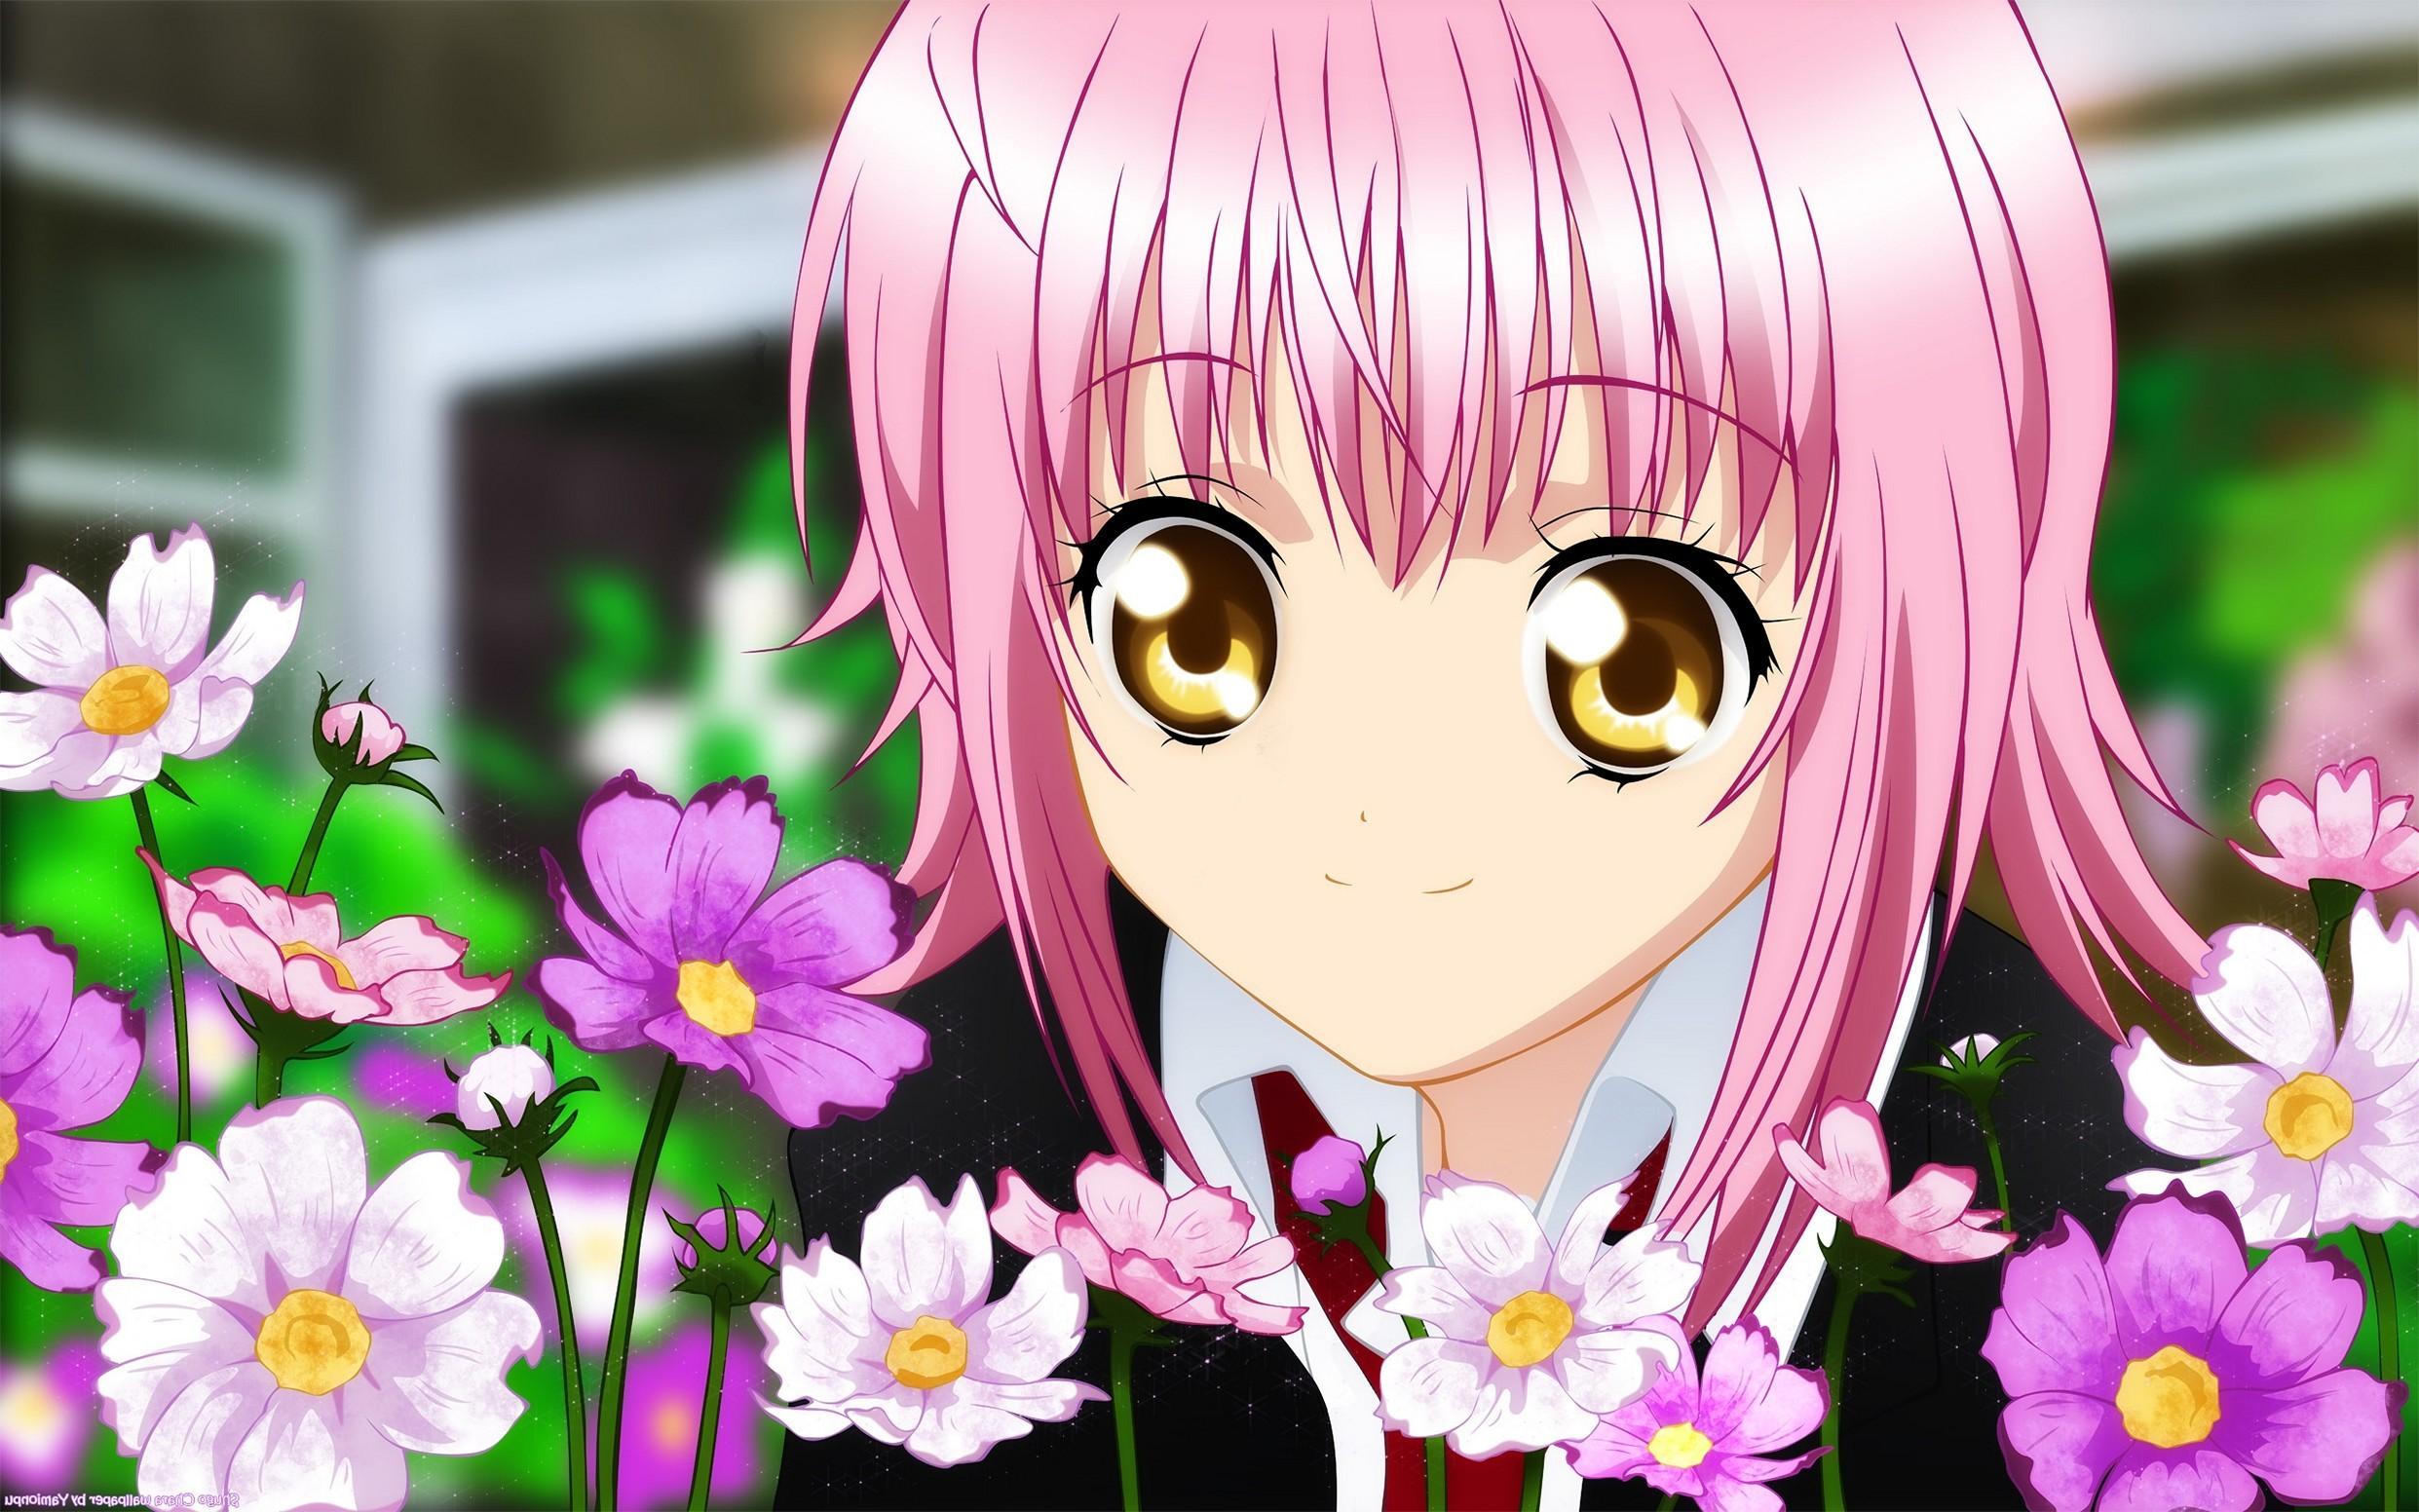 Girl Cute Flowers Smiling Pink Favorite Anime Wallpaper Phone